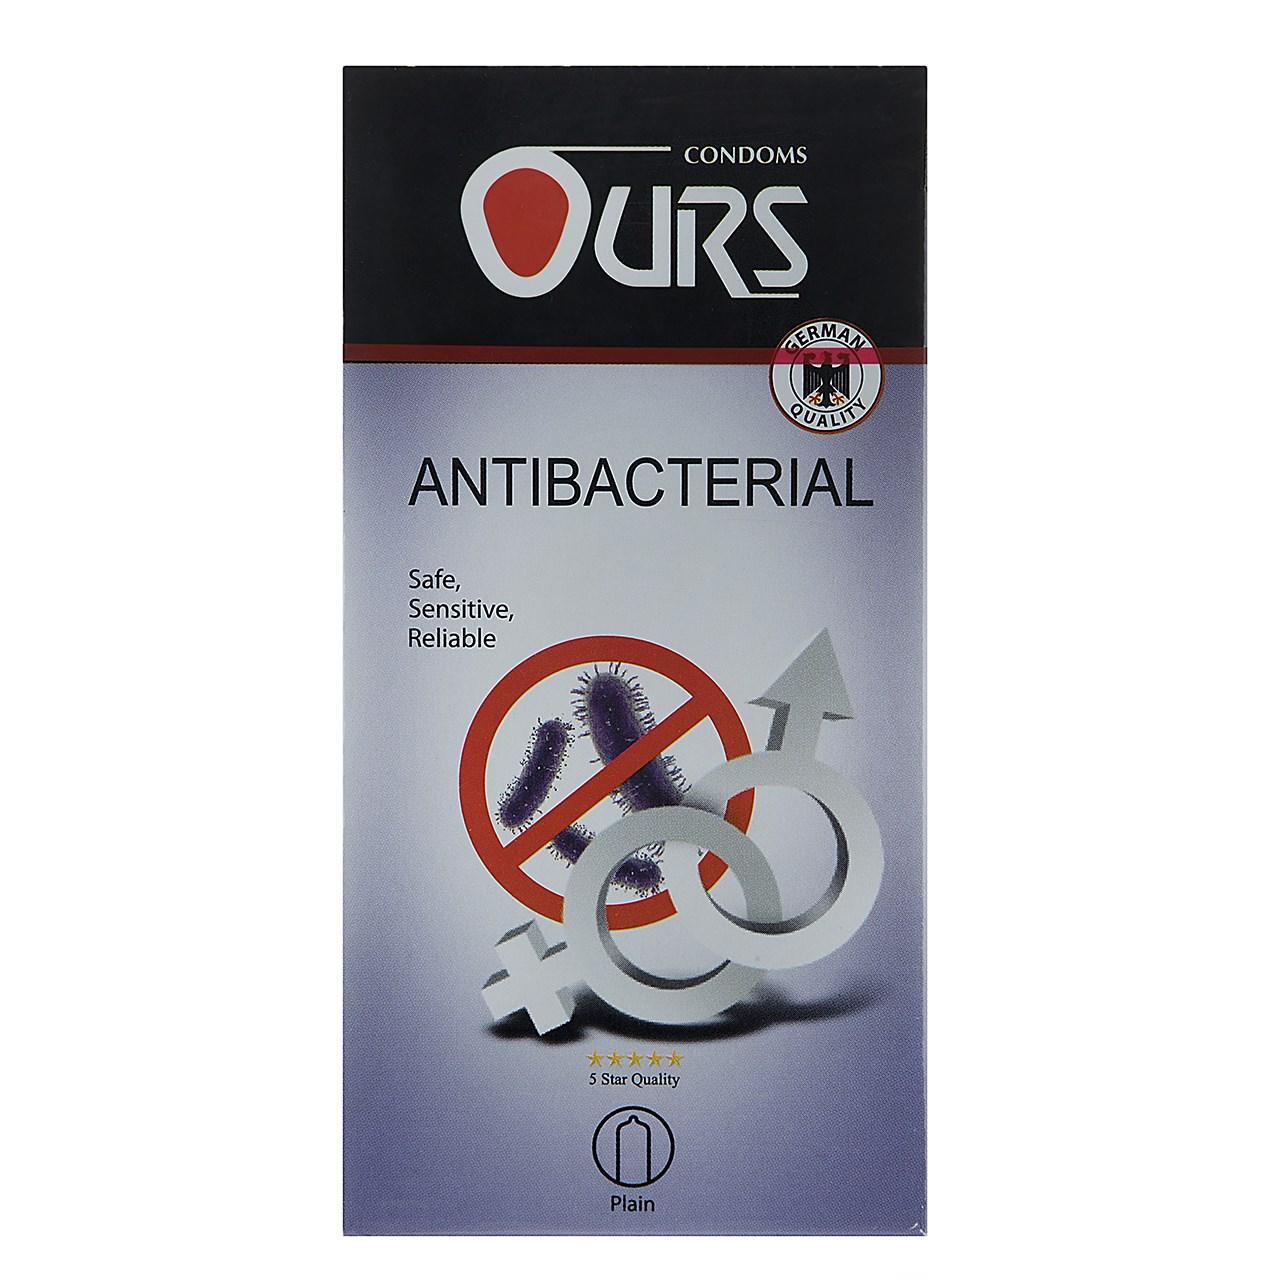 قیمت کاندوم اورز مدل Antibacterial And Antifungal بسته 12 عددی